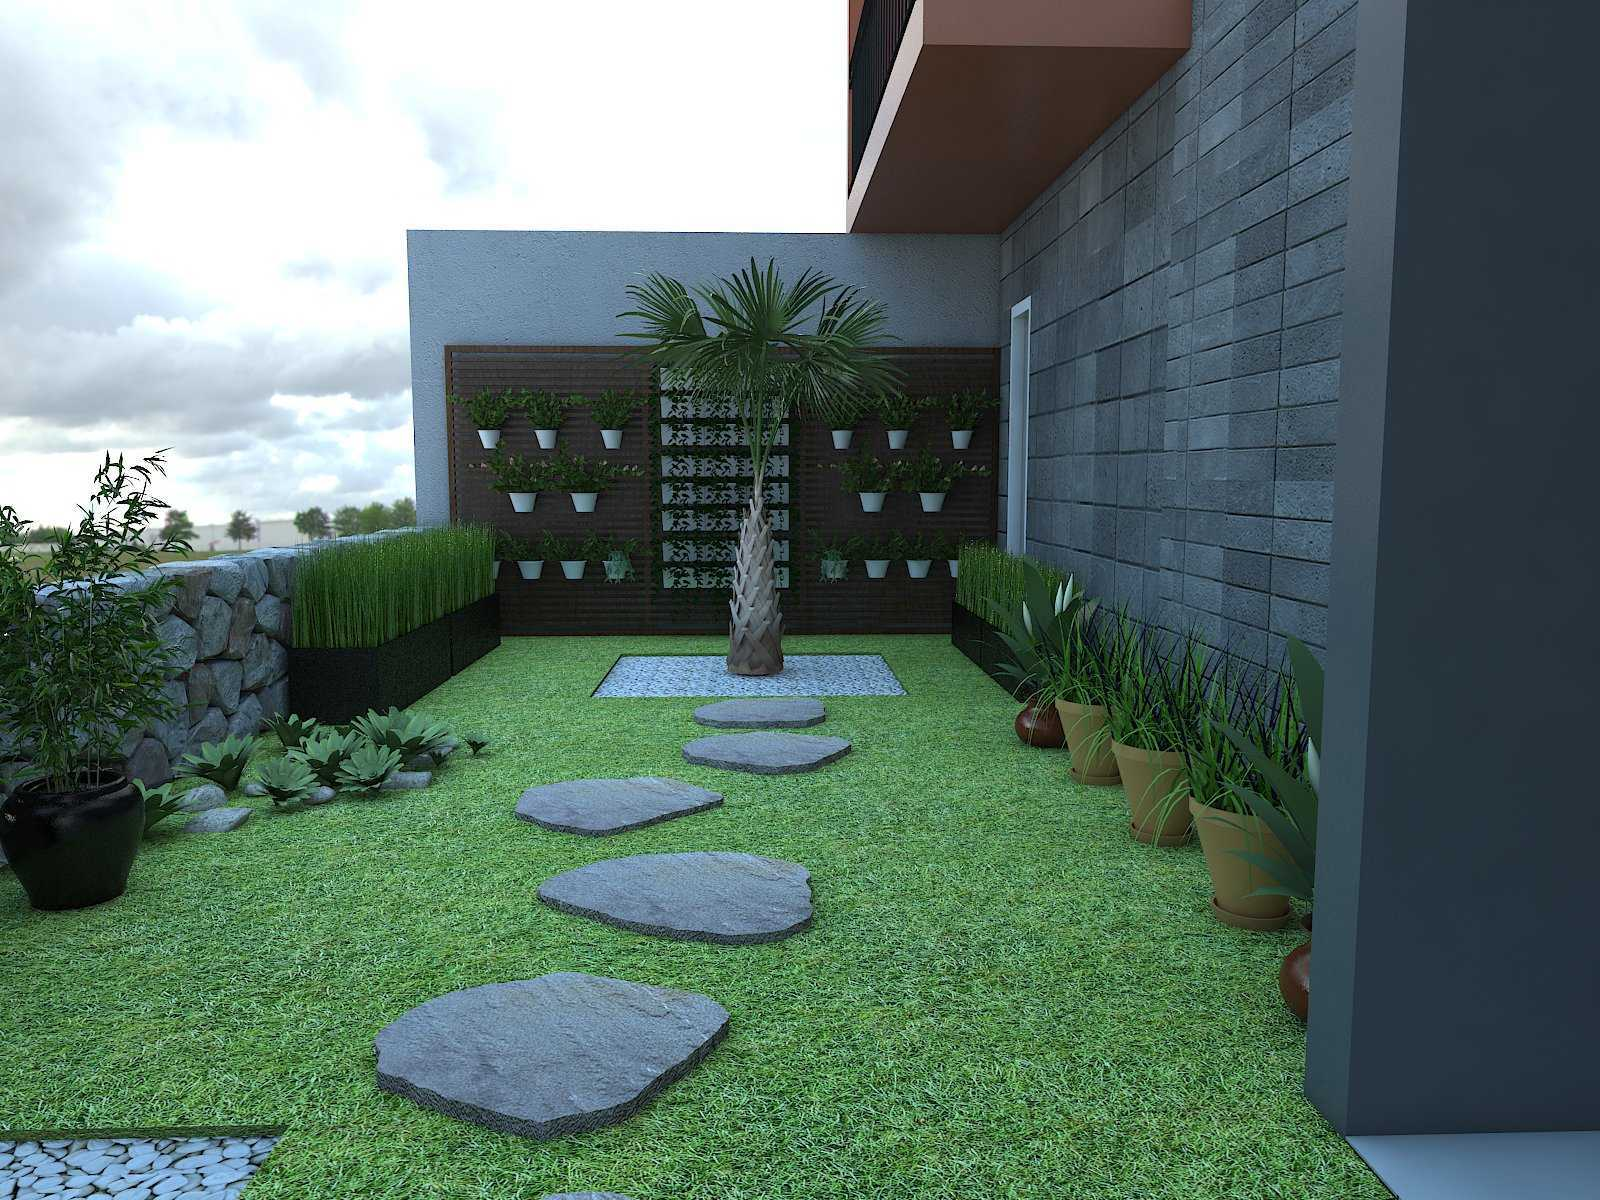 Donnie Marcellino Mr.f's House  Gg. Buntu 2, Jatimelati, Pondokmelati, Kota Bks, Jawa Barat 17415, Indonesia Greenery Design Kontemporer  30159